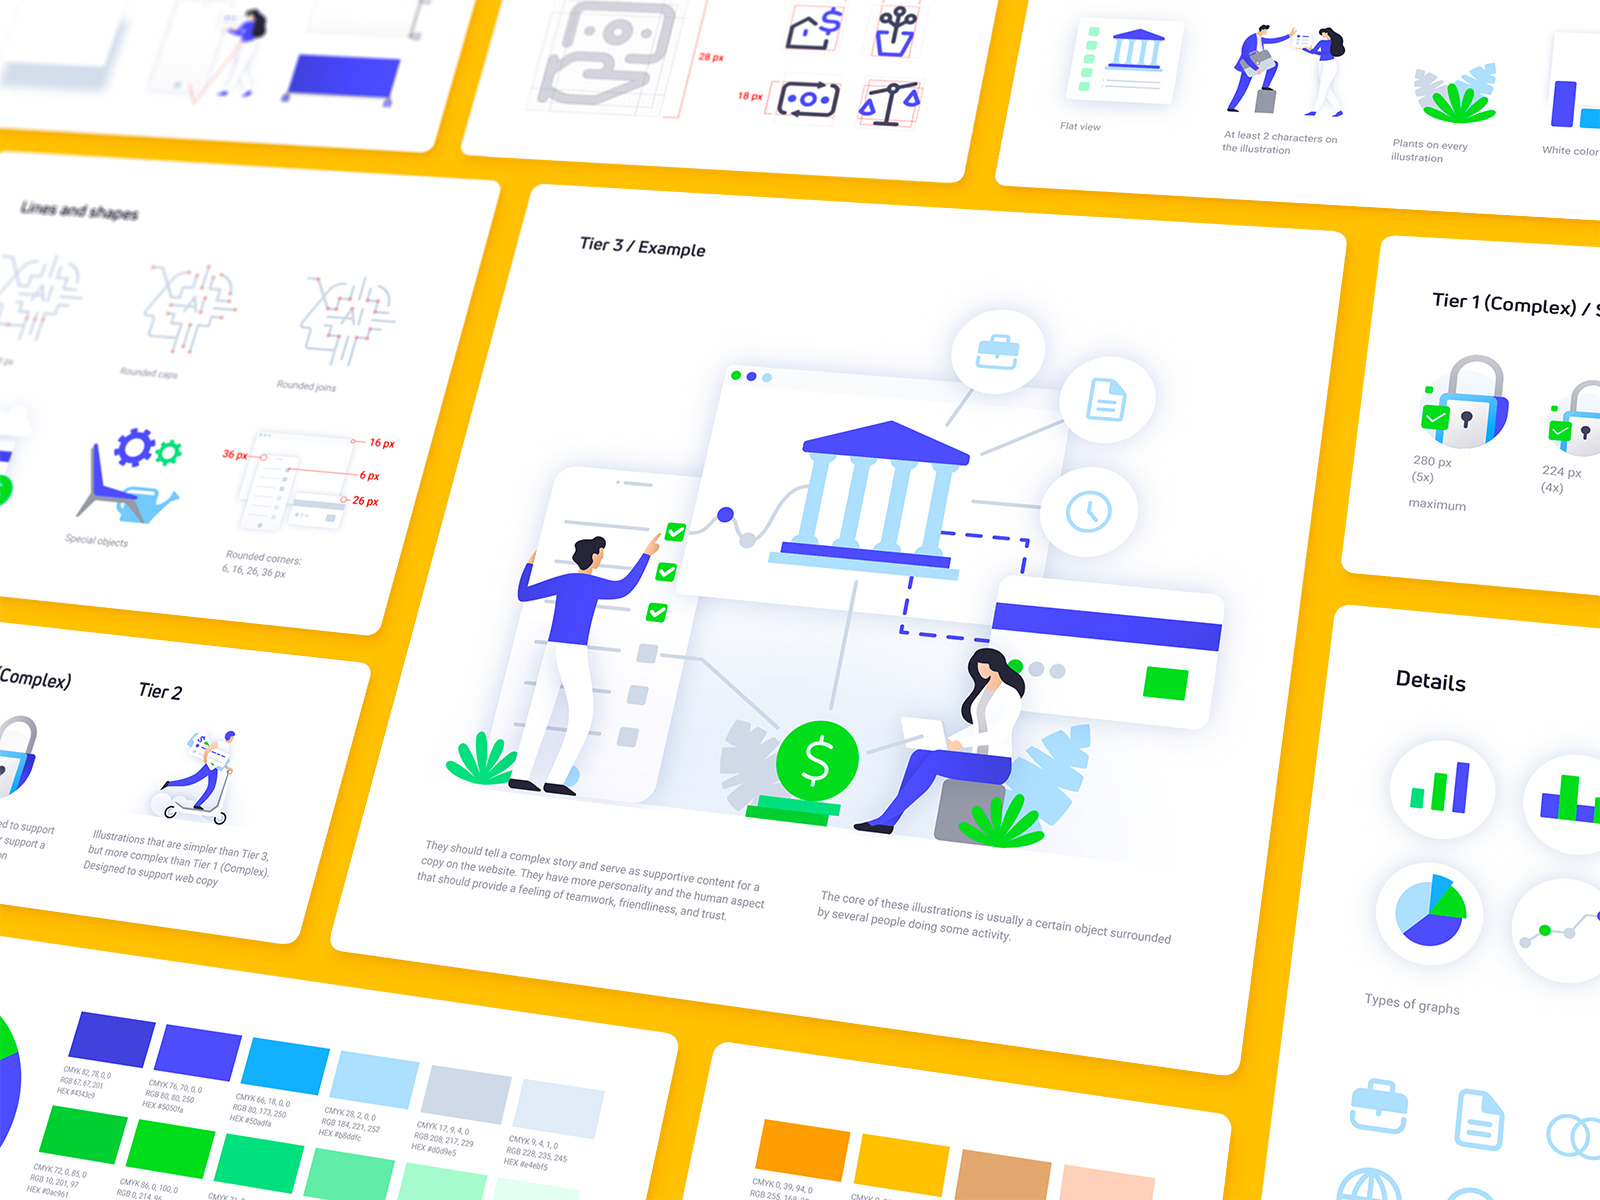 assetly holistic illustrative guide